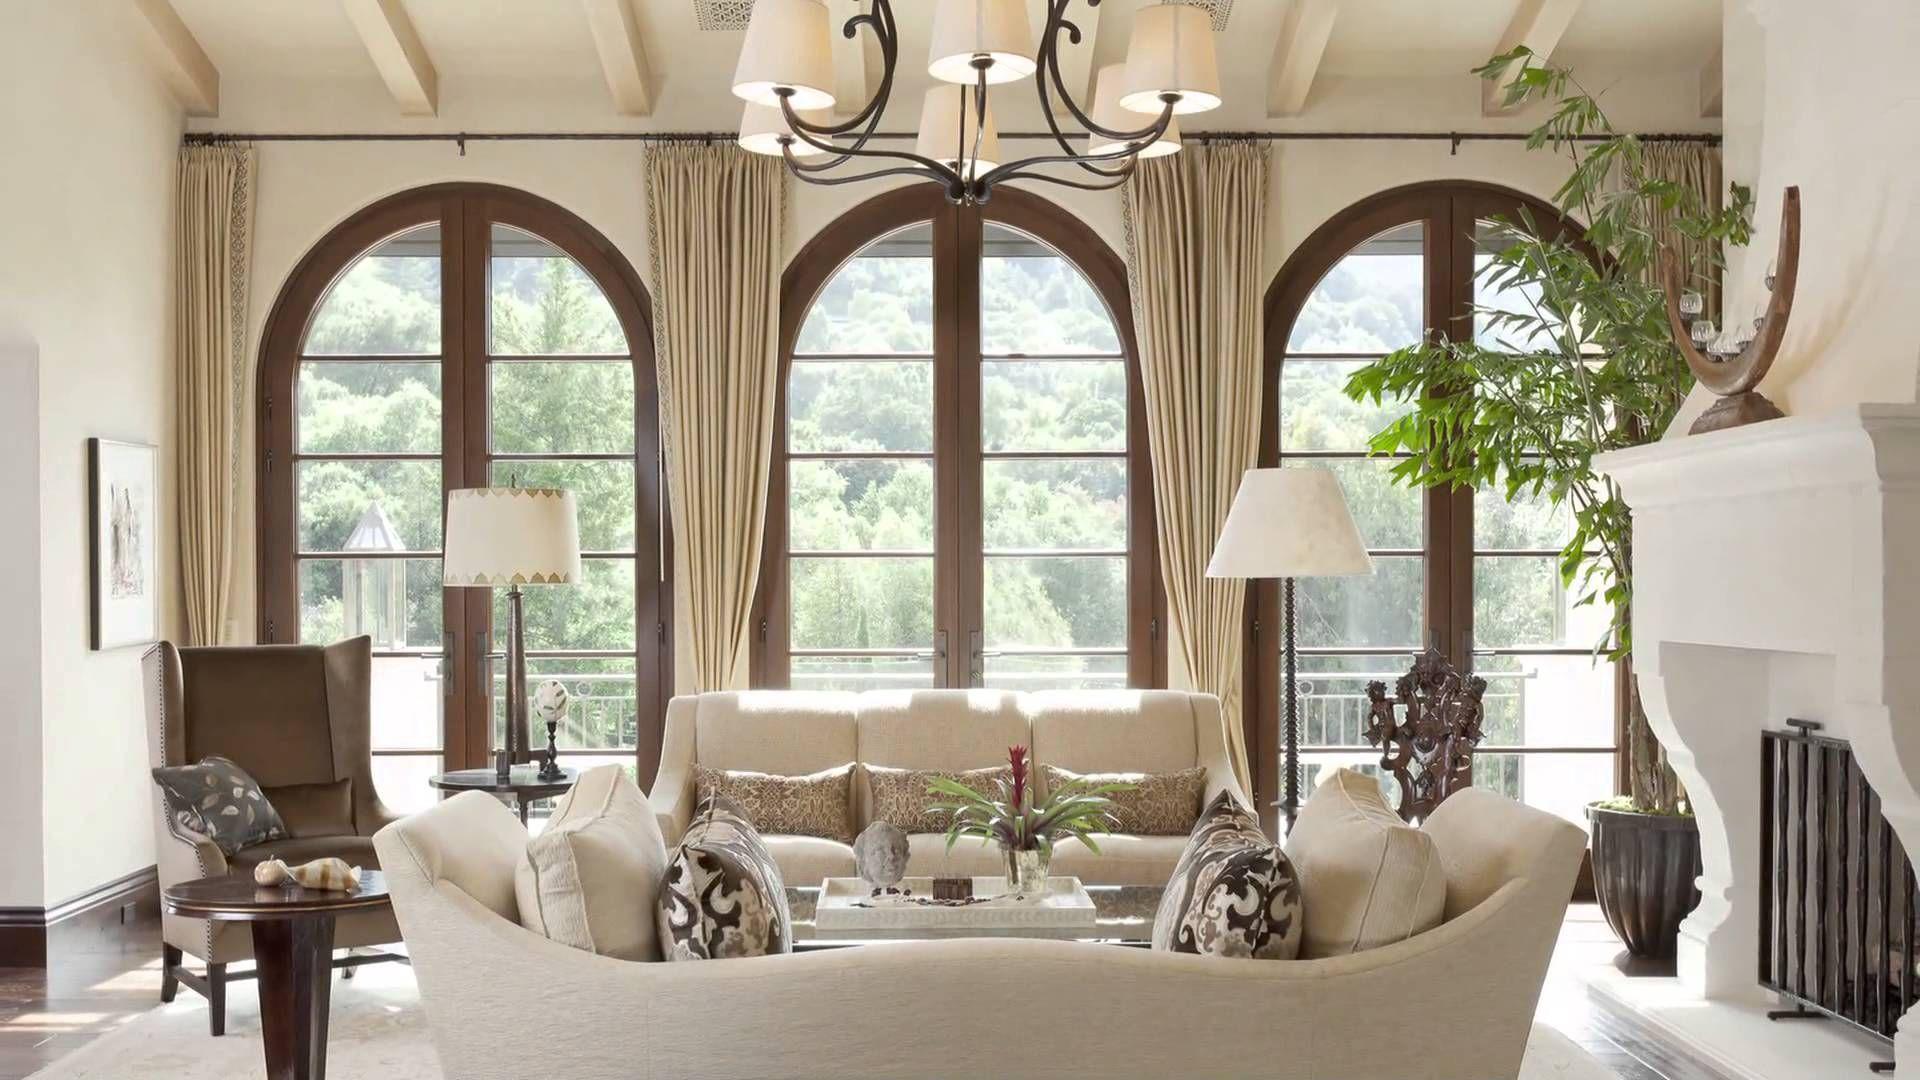 Beautiful Mediterranean Living Room Mediterranean Interior Design Mediterranean Style Homes Mediterranean Style House Plans